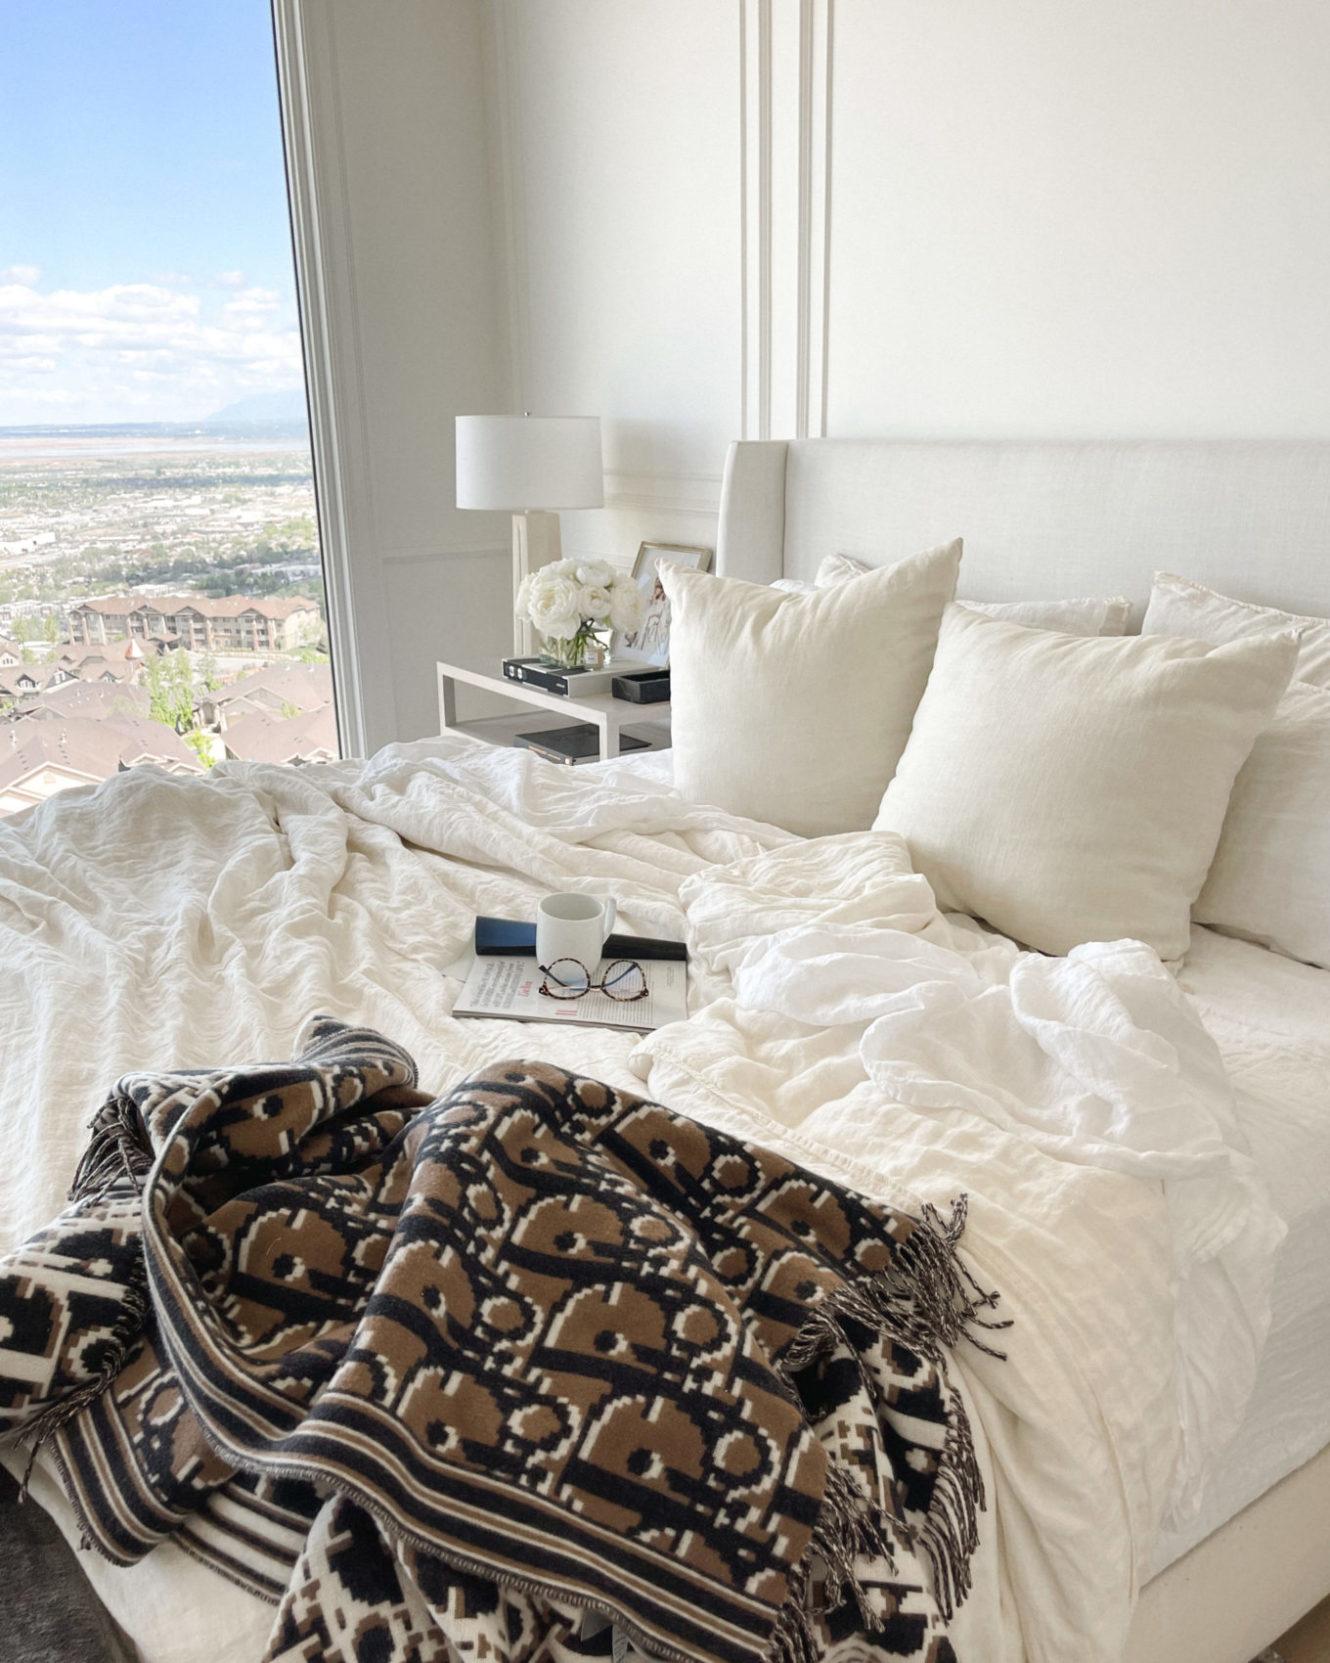 bed, bedroom, linen sheets, linen spray, cozy